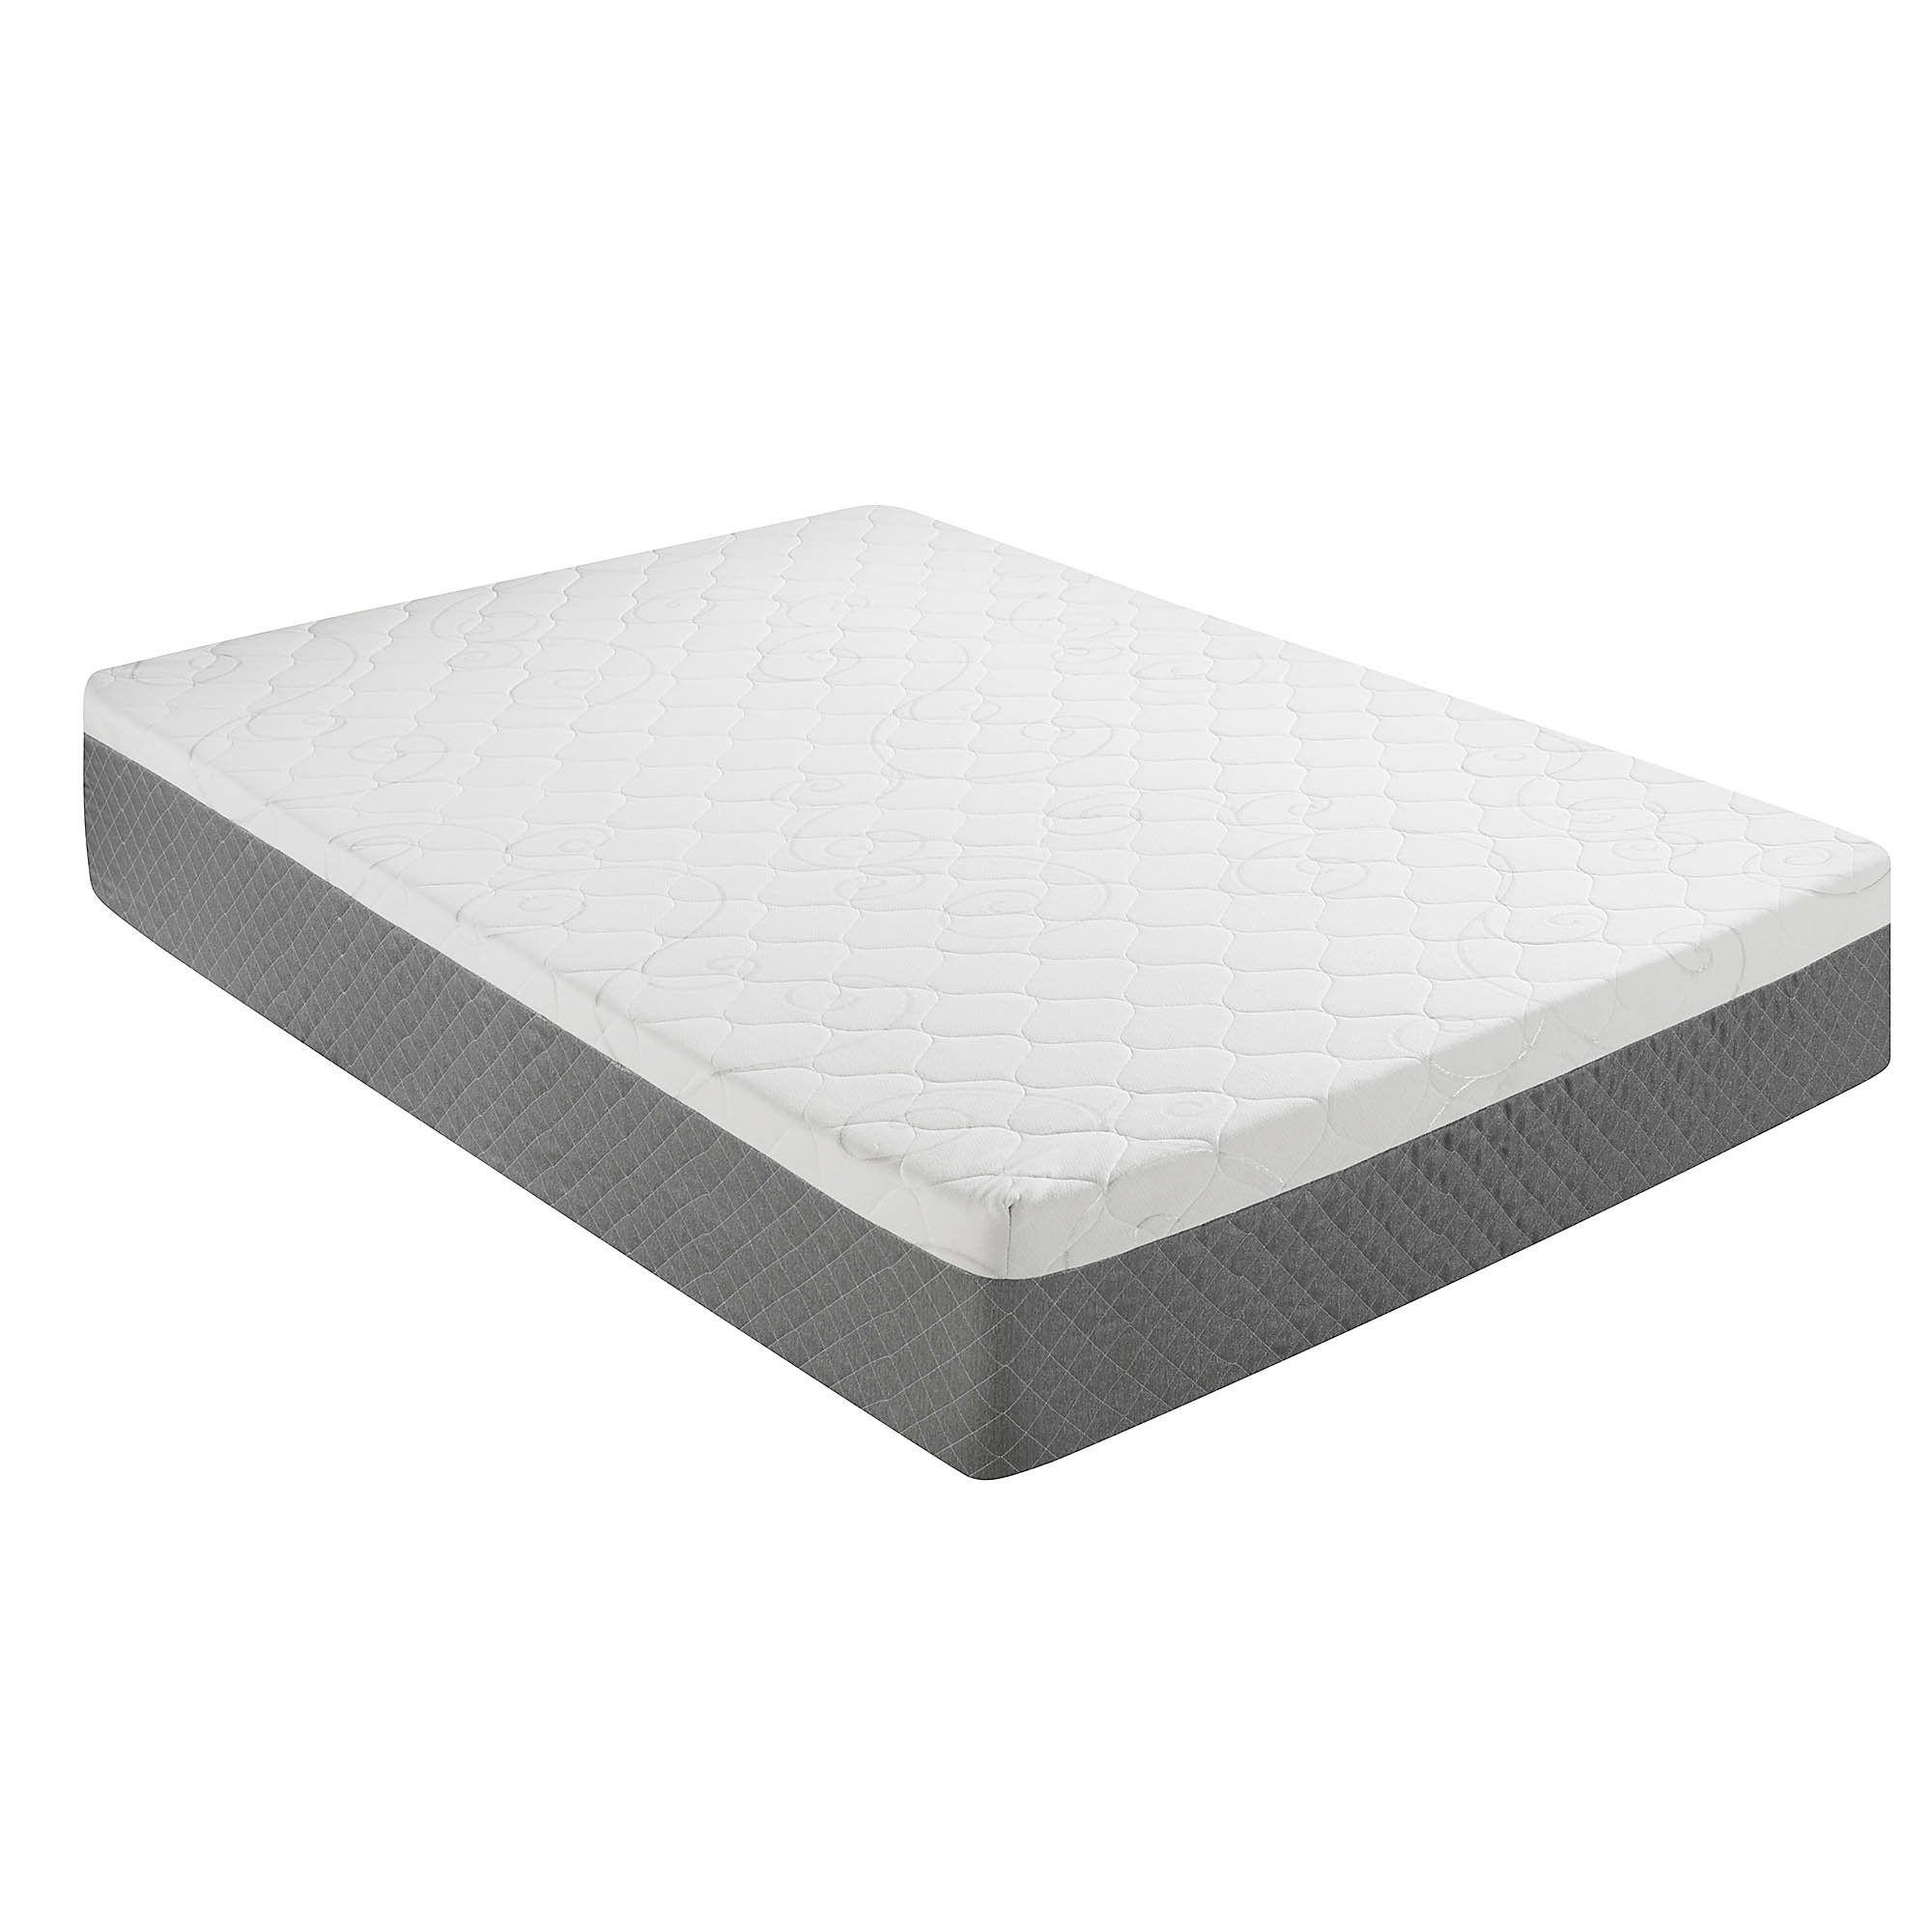 Amazon Com Sleep Innovations 12 Inch Gel Swirl Memory Foam